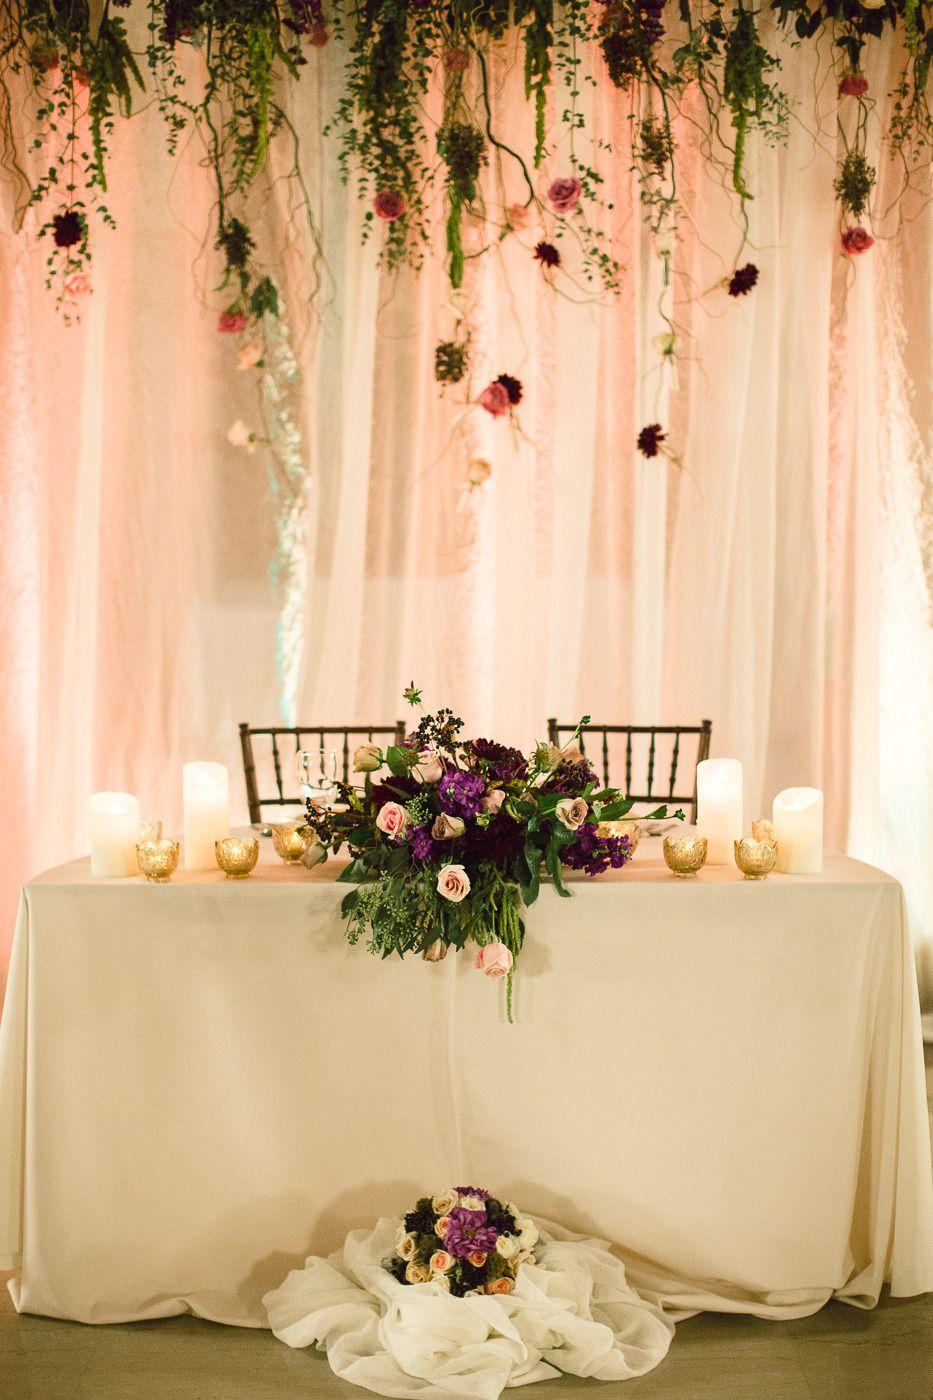 Cleveland City Hall Rotunda Wedding Wedding Reception Backdrop Head Table Wedding Bridal Table